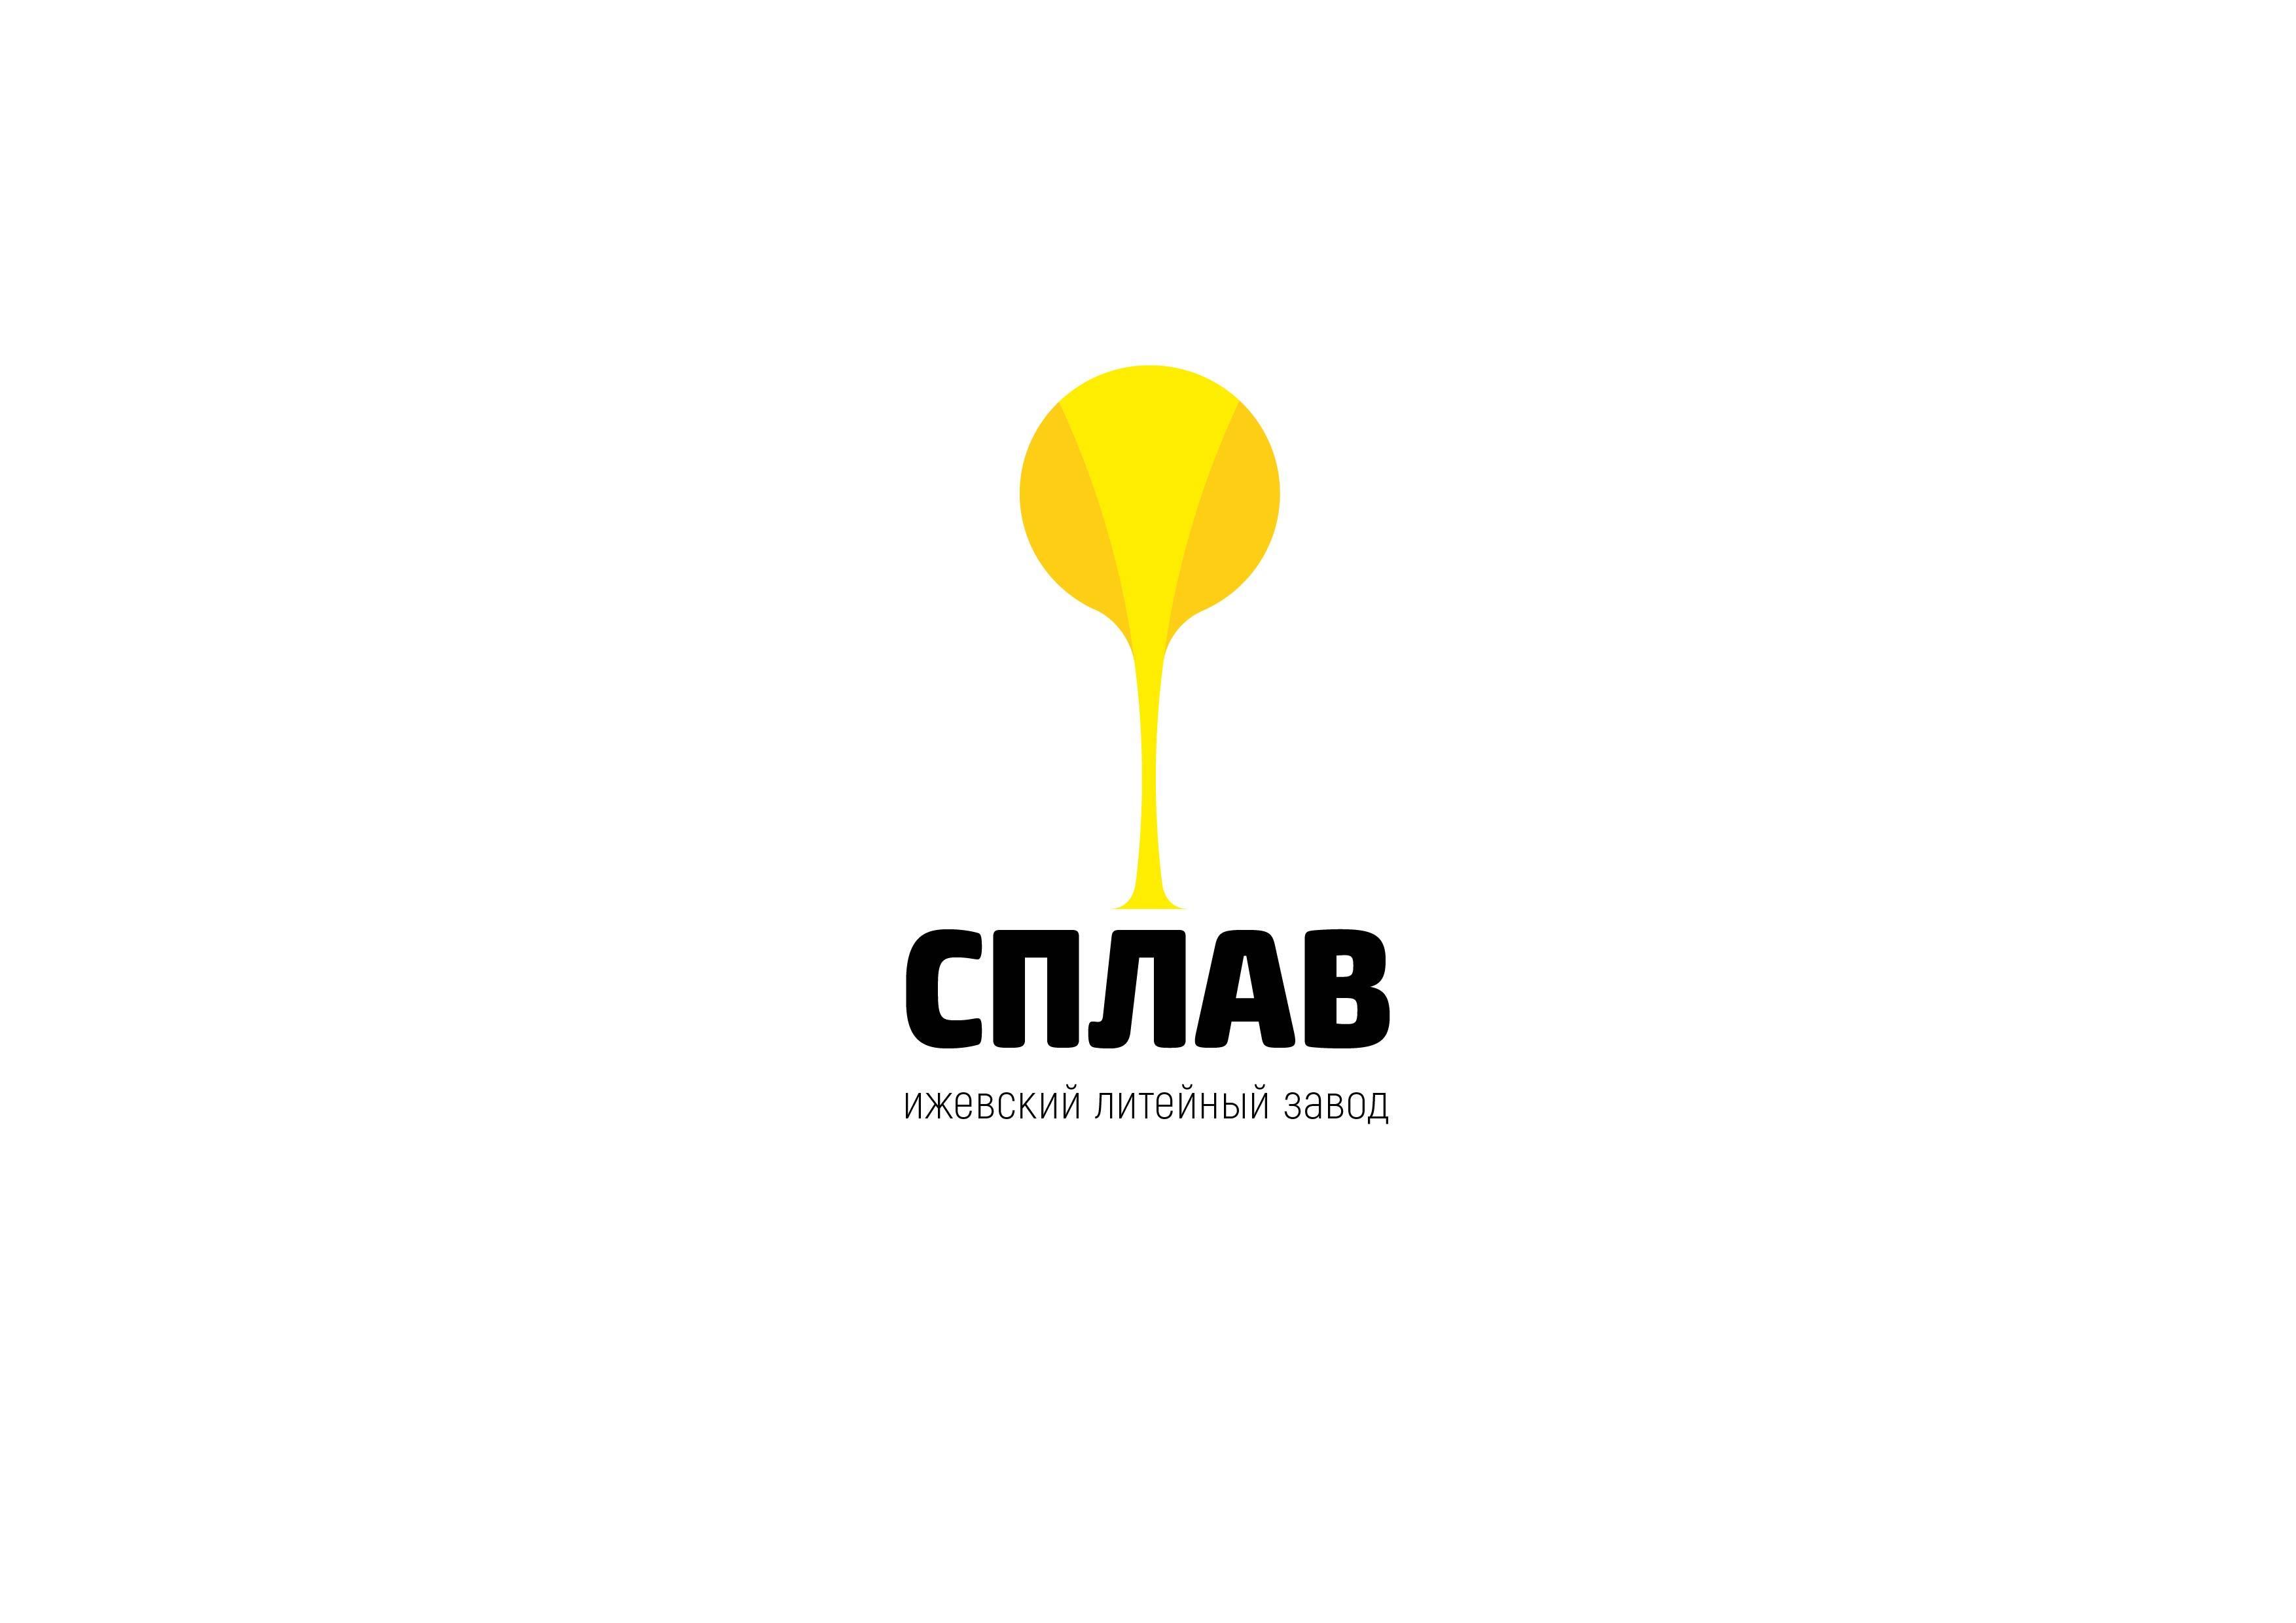 Разработать логотип для литейного завода фото f_8685b0478c4a703b.jpg